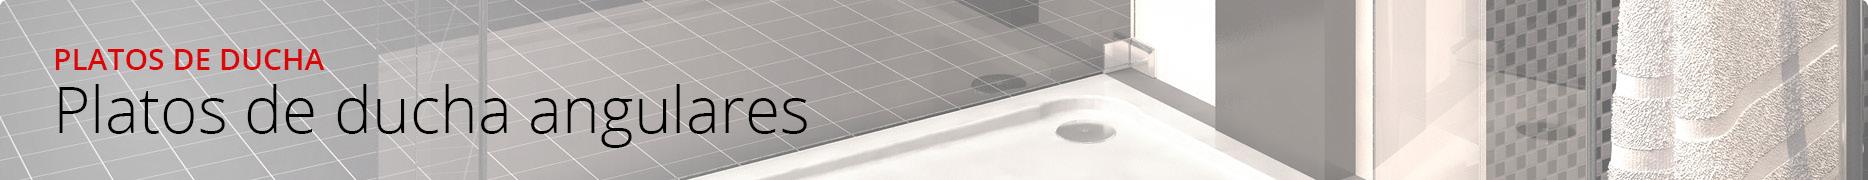 Platos de ducha angulares